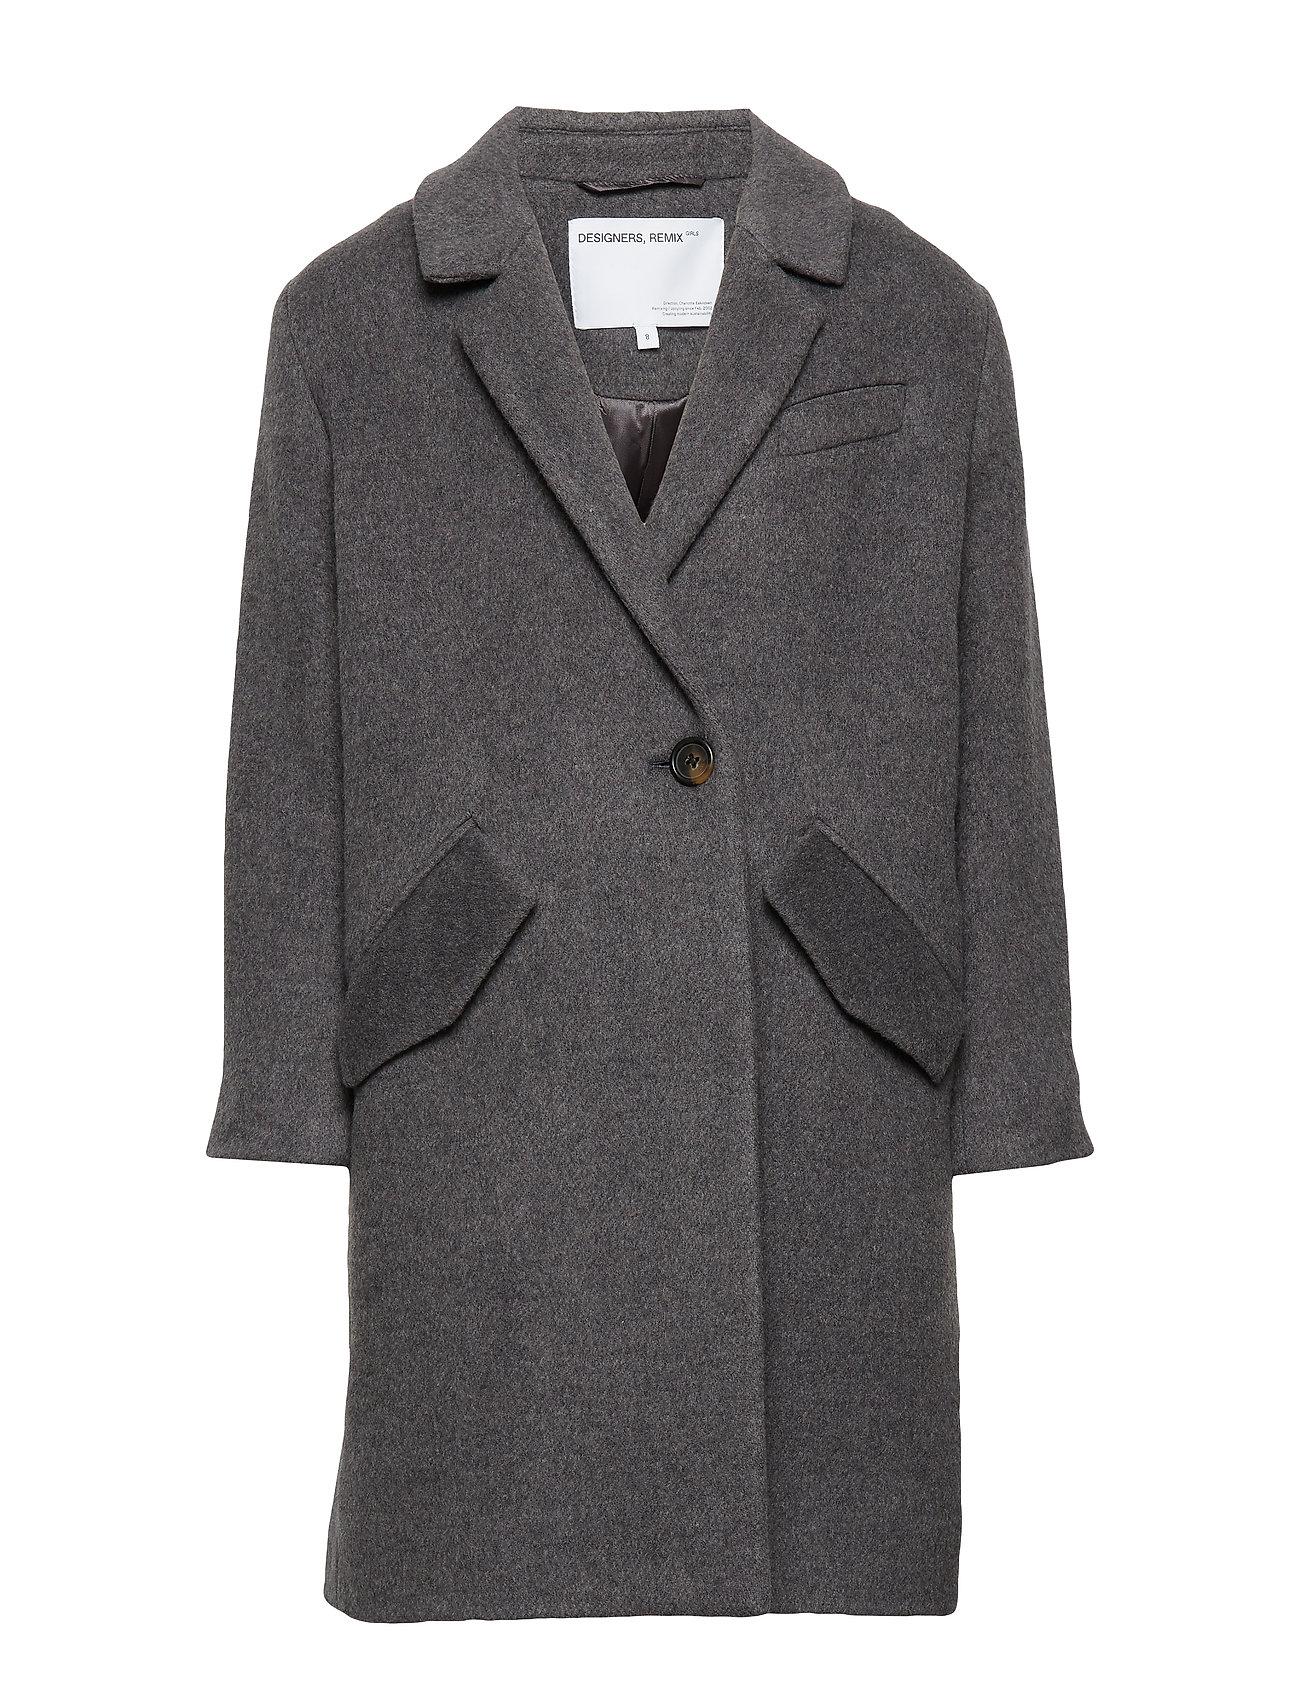 Image of Lr Hardy Coat Outerwear Wool Outerwear Grå Designers Remix Girls (3210822447)